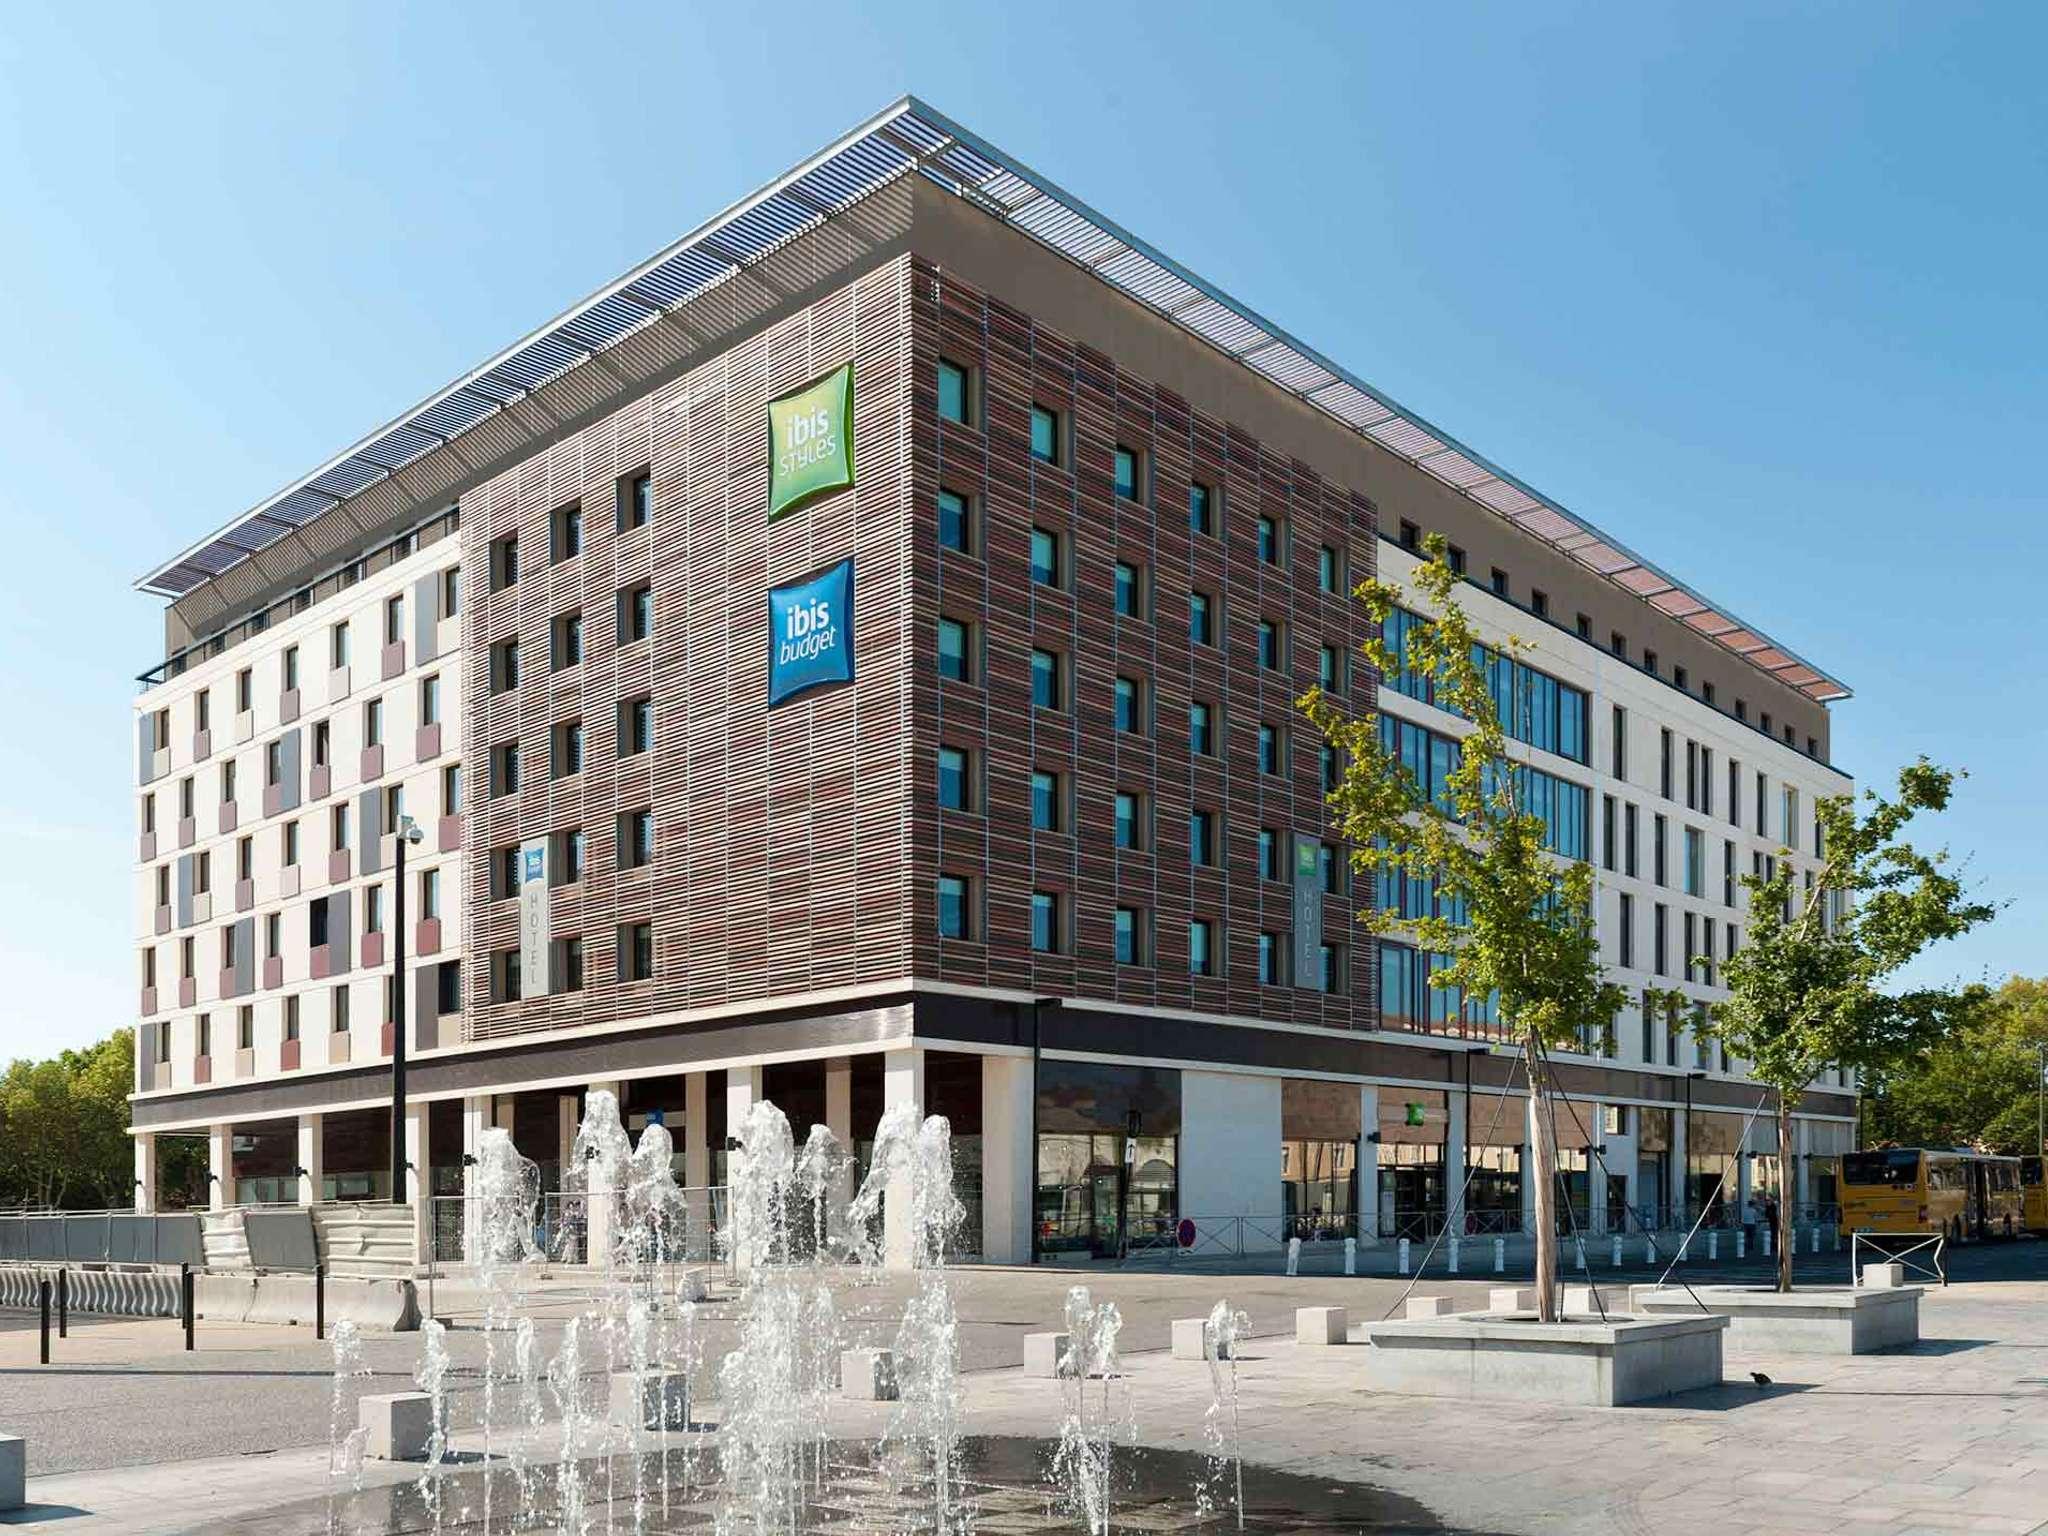 Chambre d hote nimes pas cher location gte chambres for Location chambre pas cher